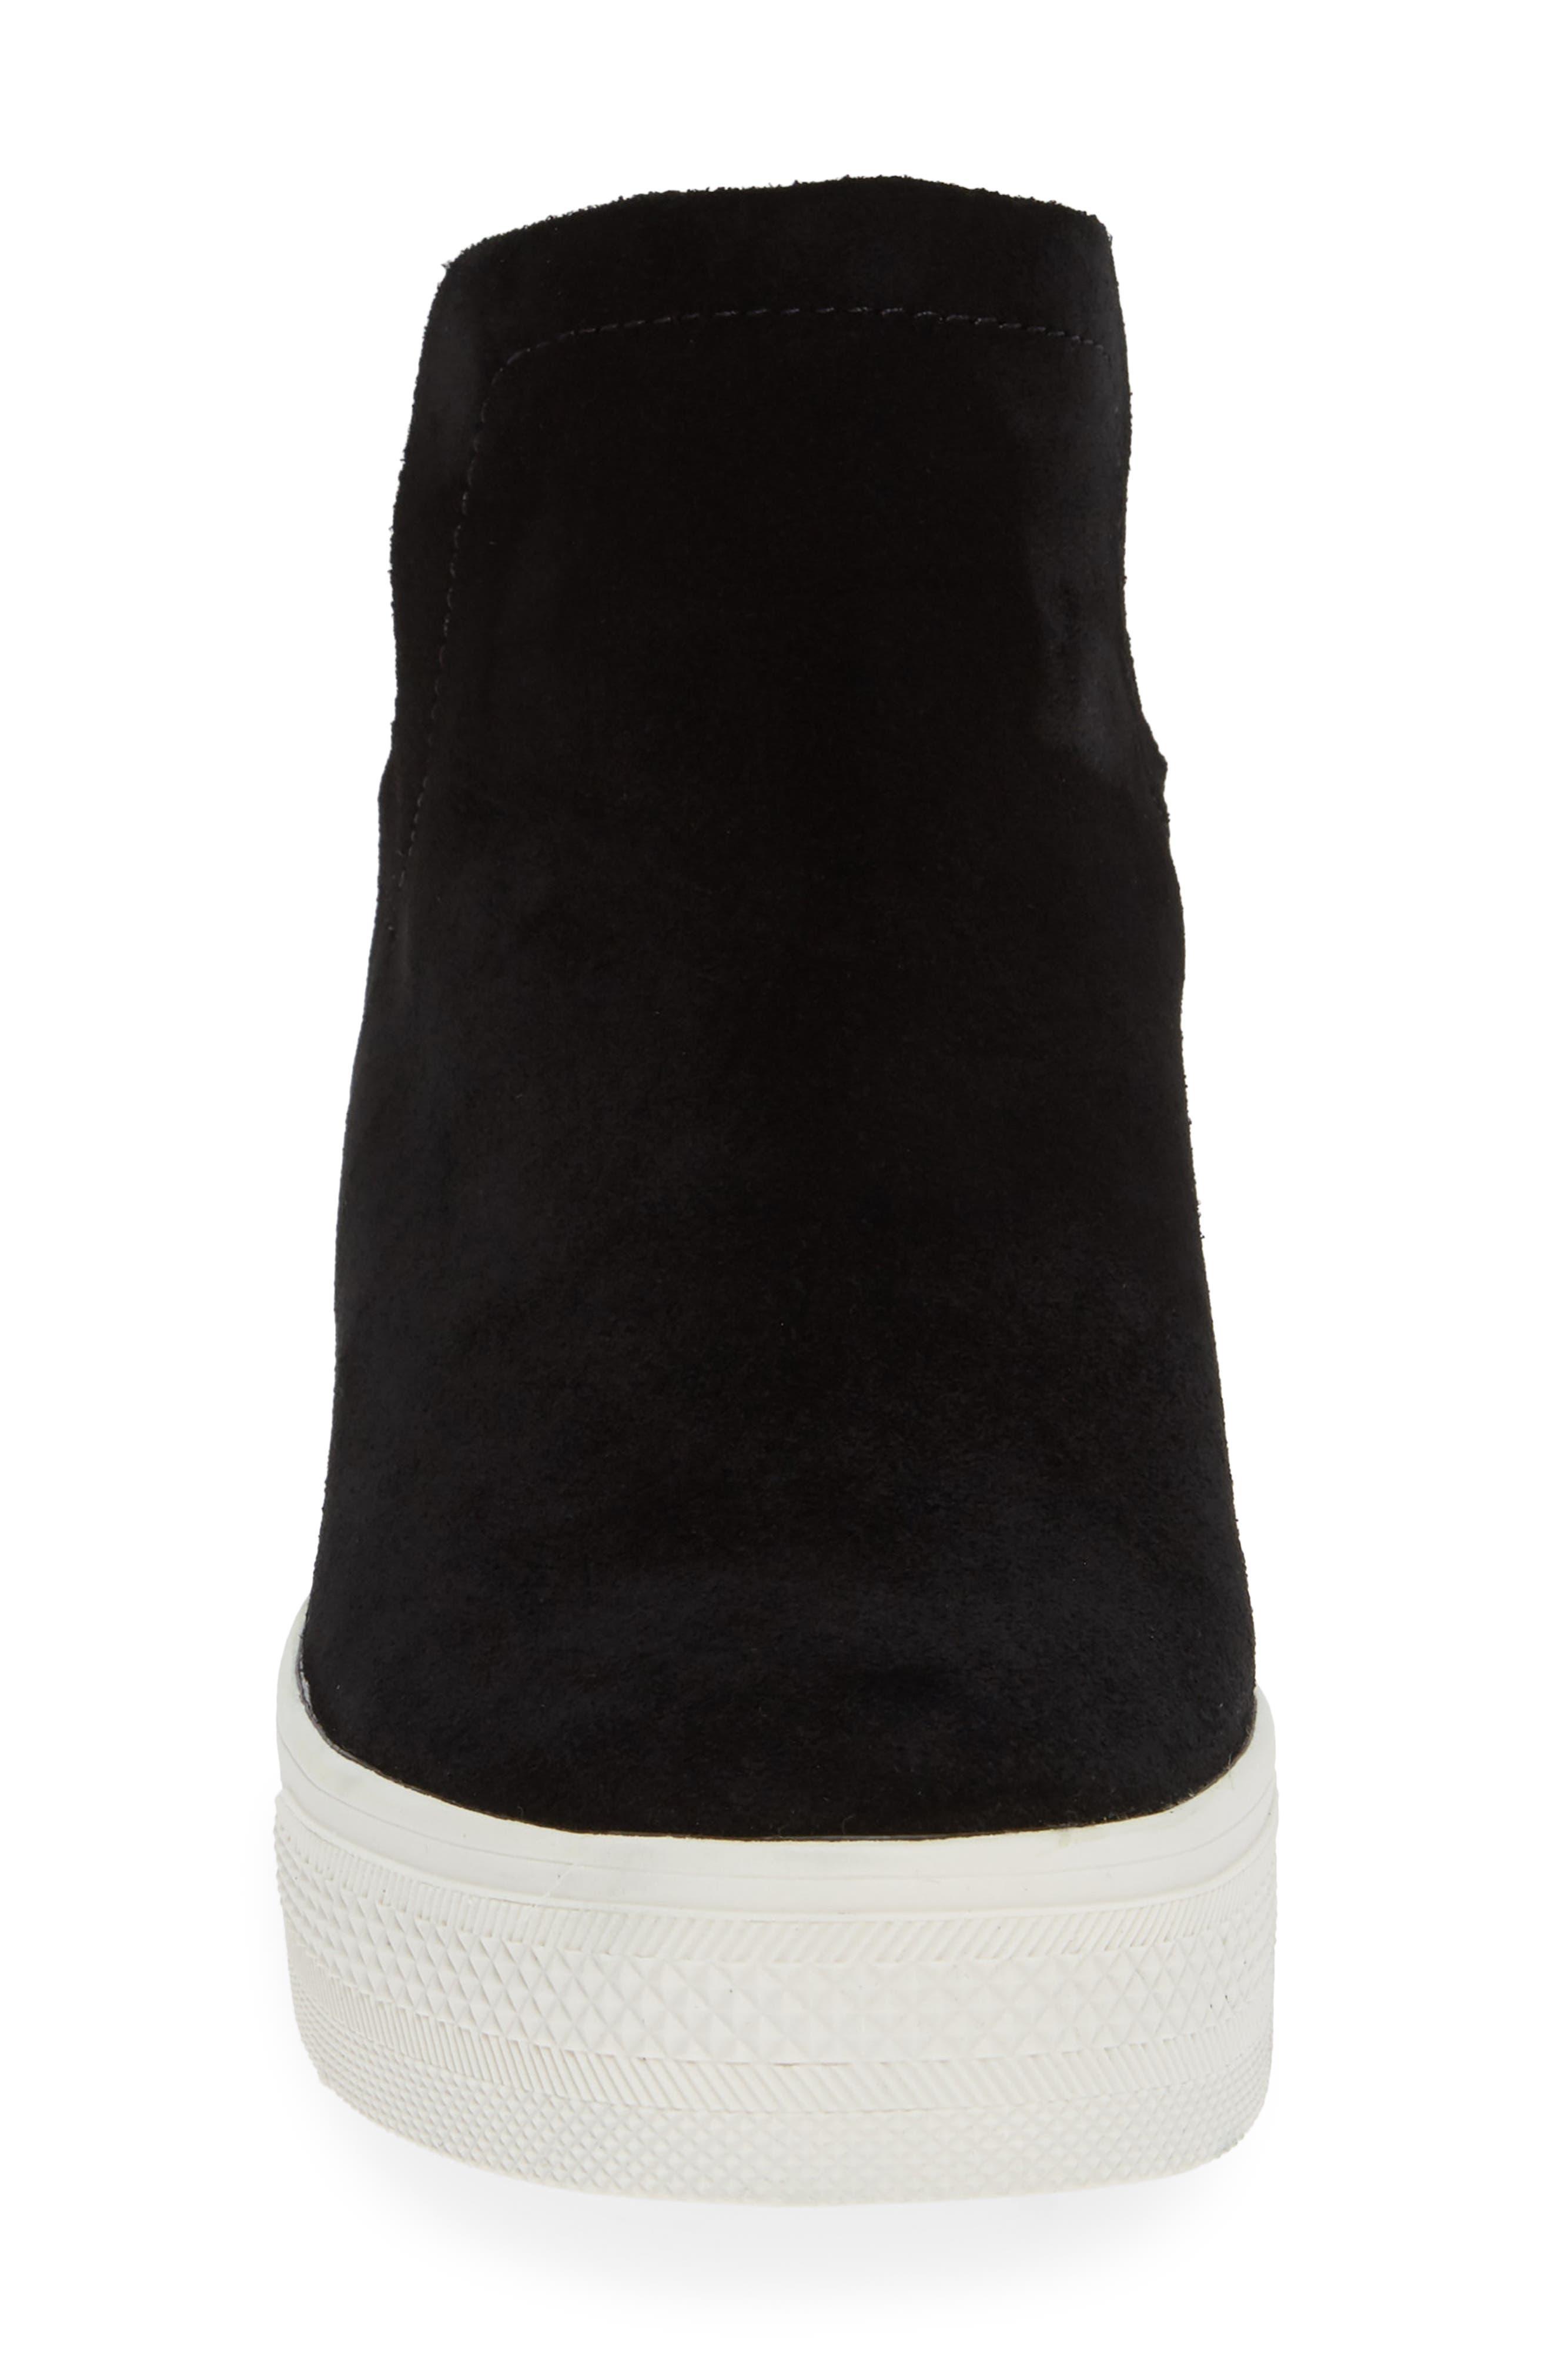 Wrangle Sneaker,                             Alternate thumbnail 4, color,                             BLACK SUEDE